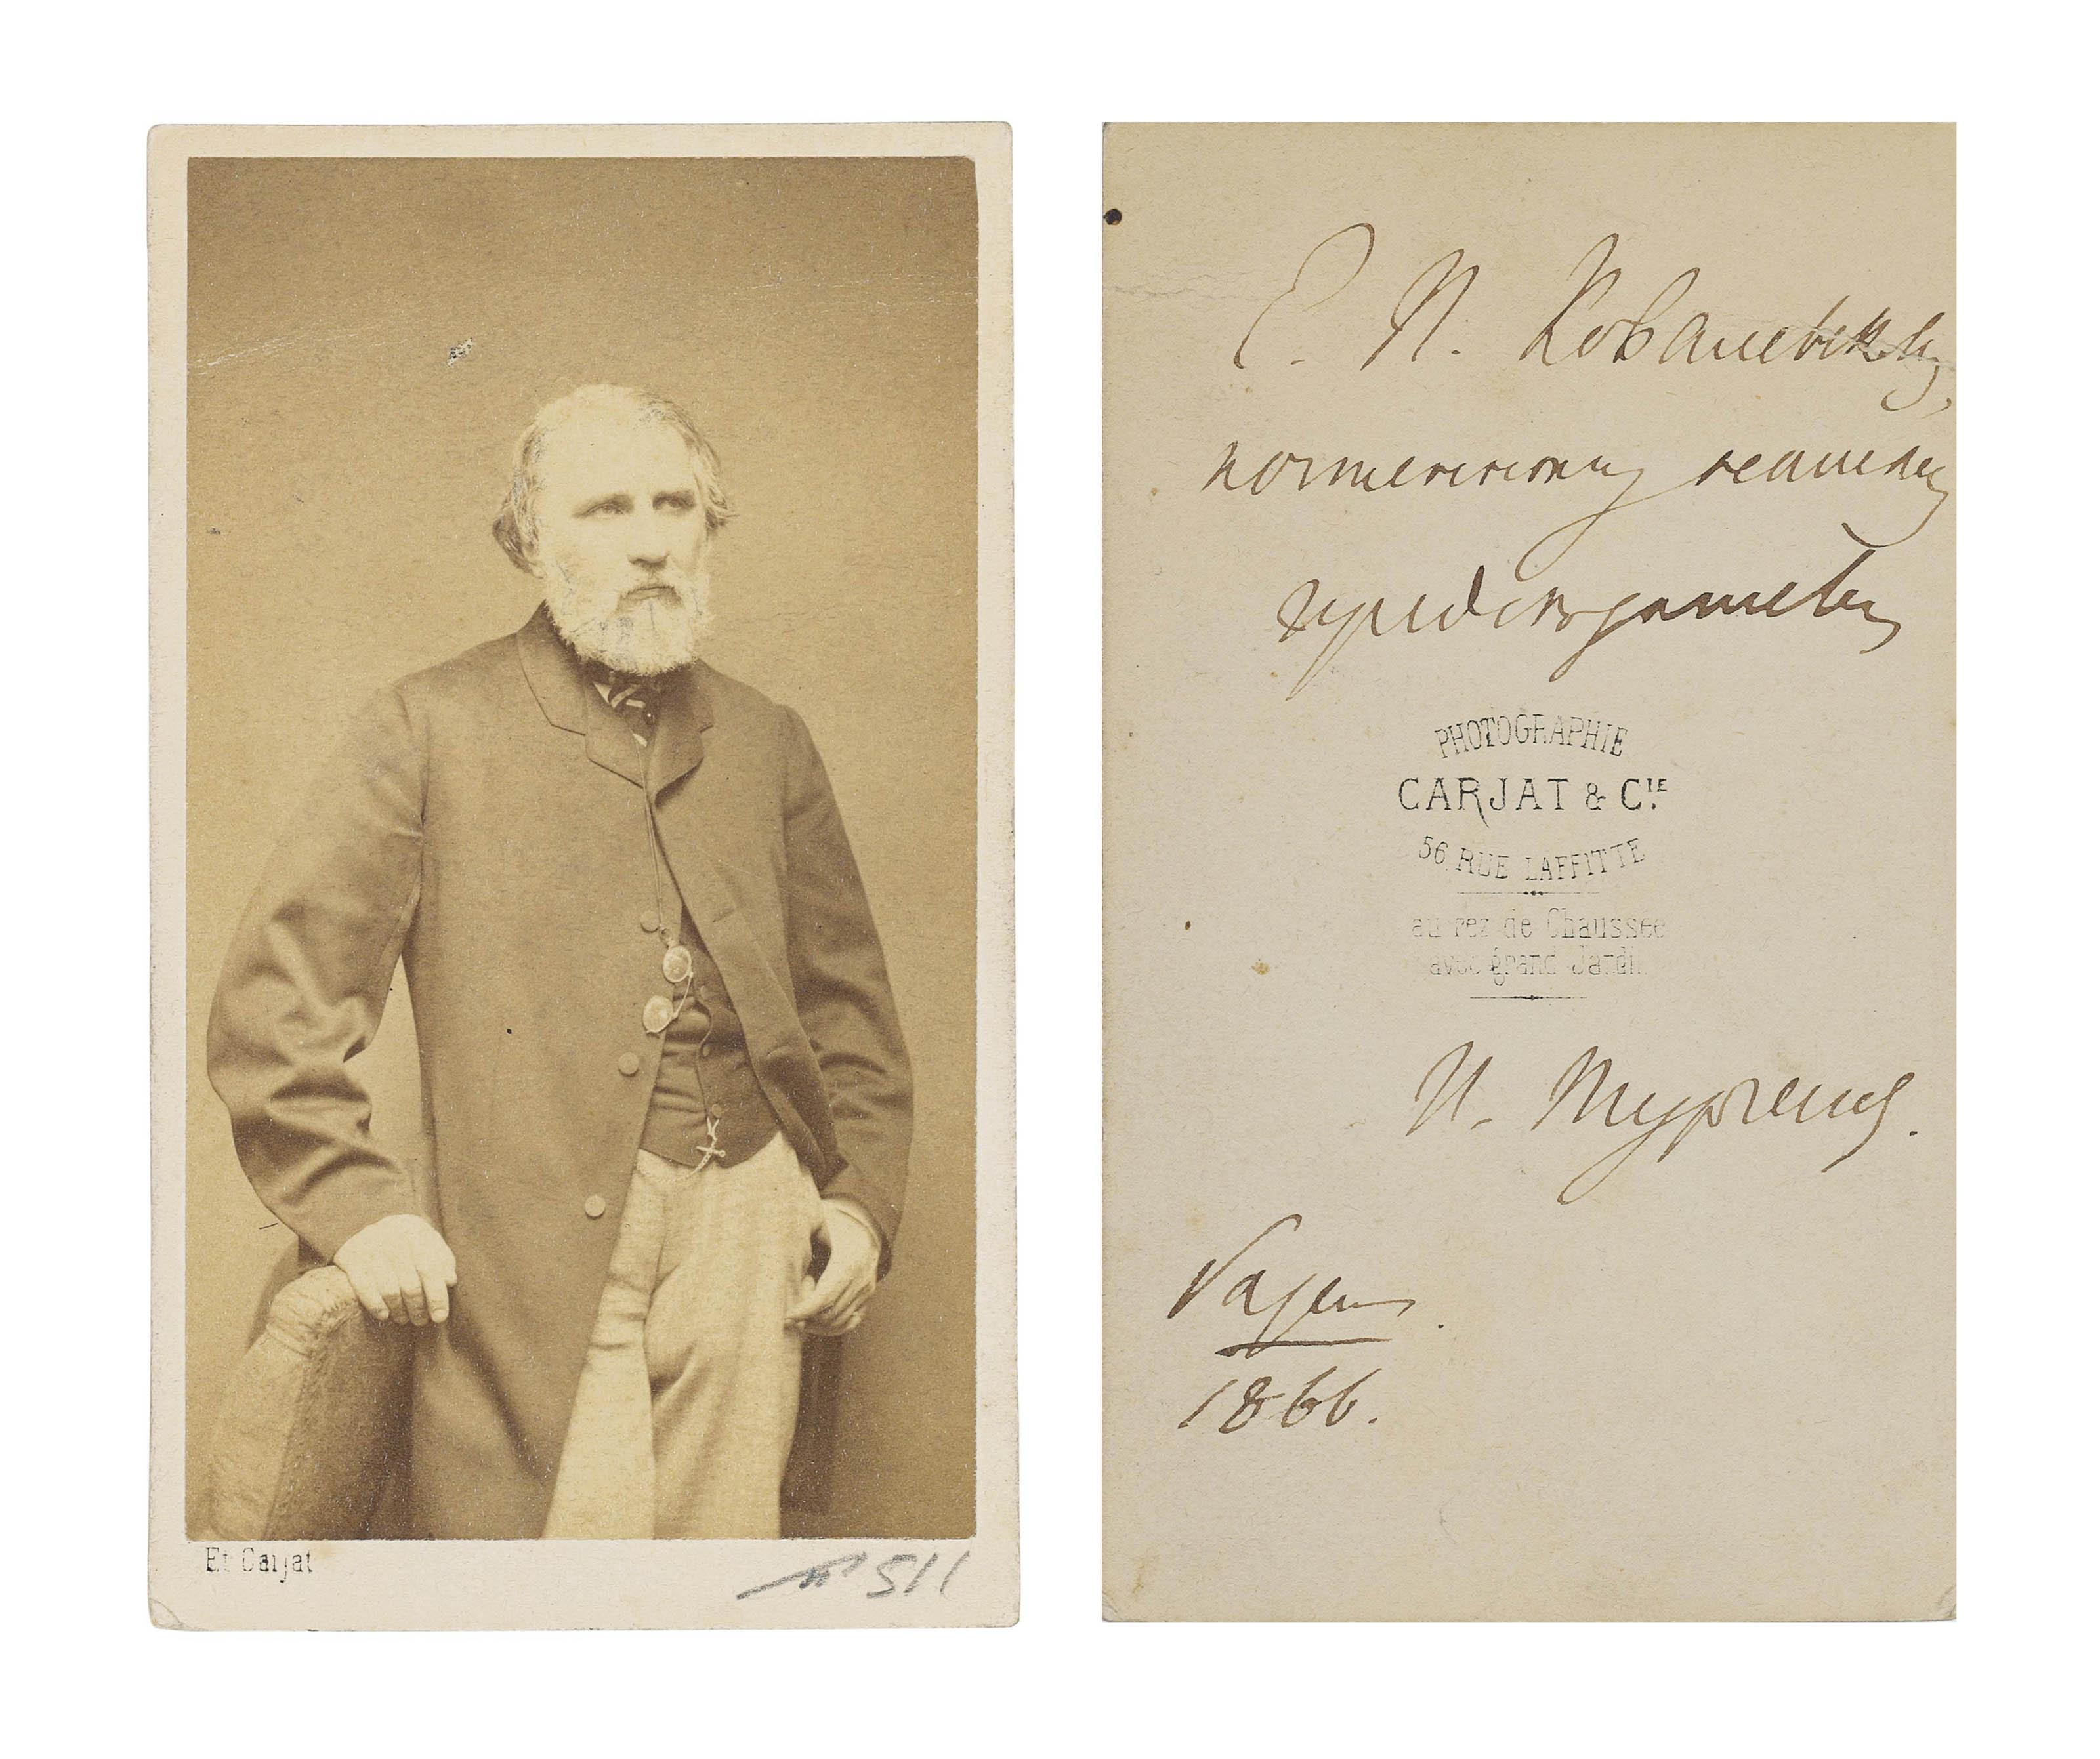 TURGENEV, Ivan (1818-1883). Ph